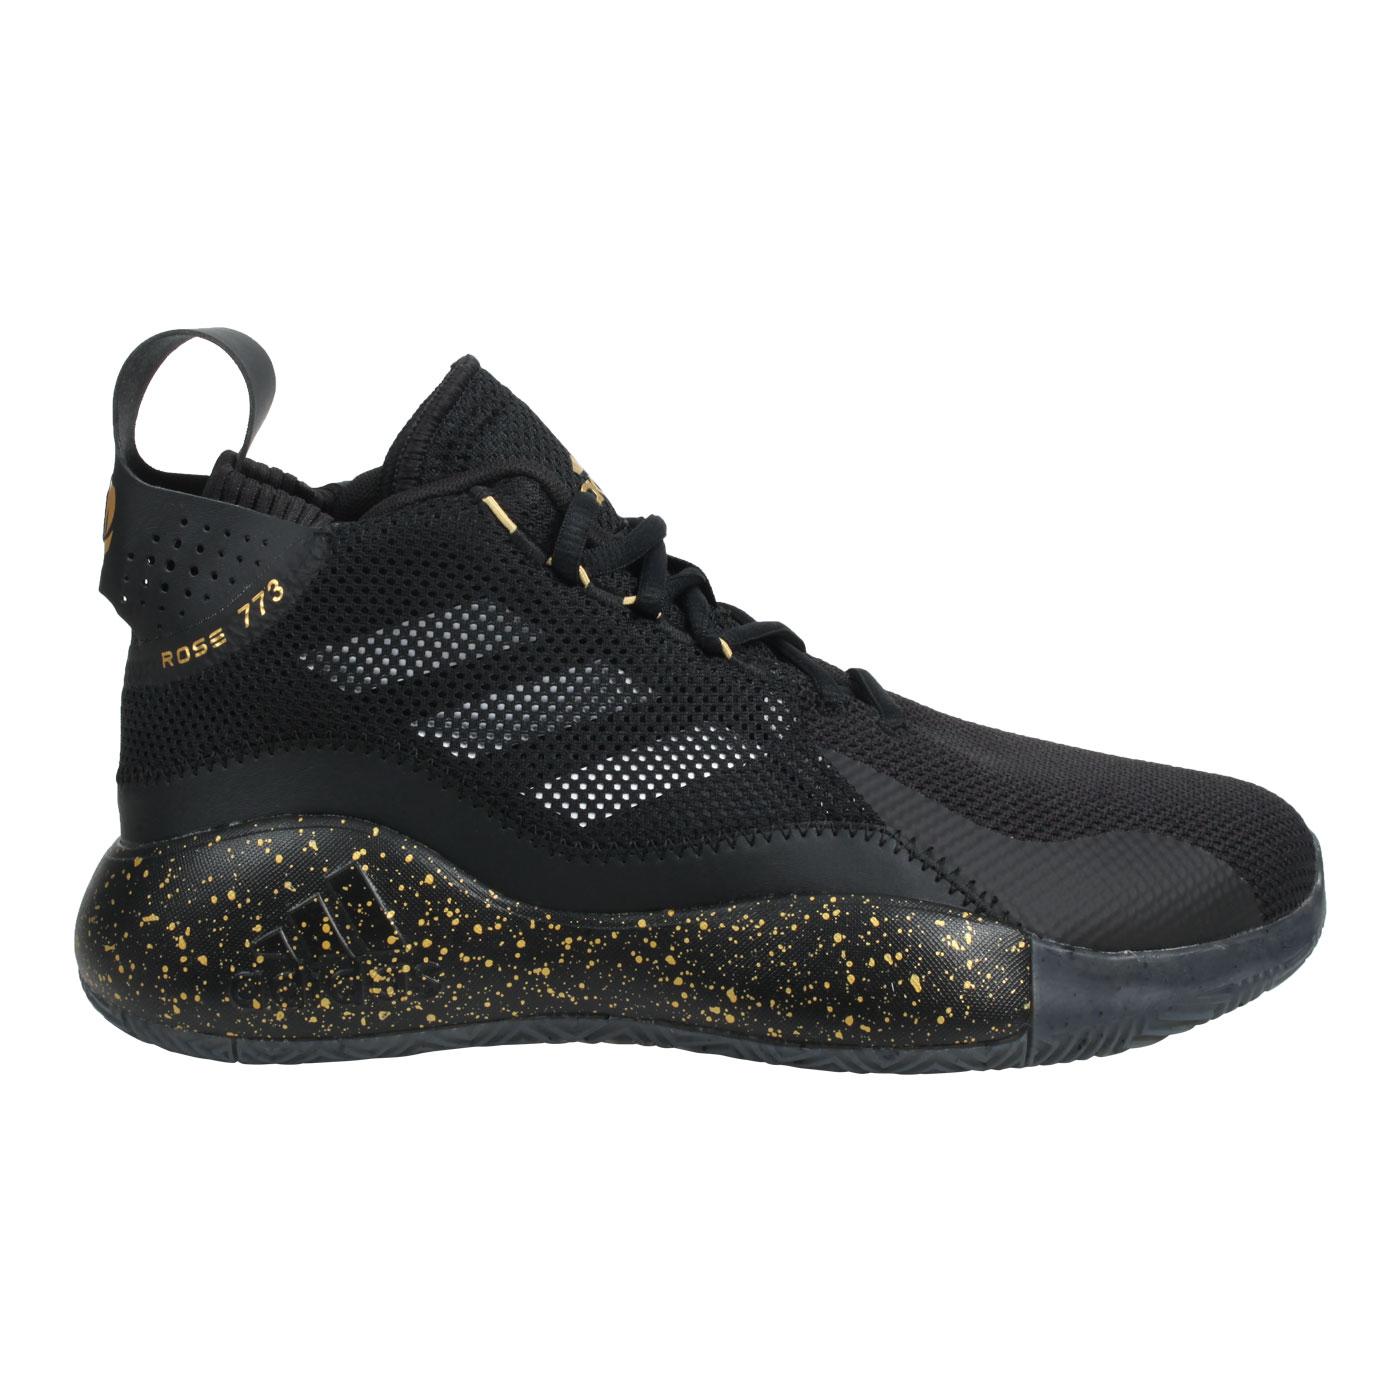 ADIDAS 男款籃球鞋 FW9838 - 黑黃